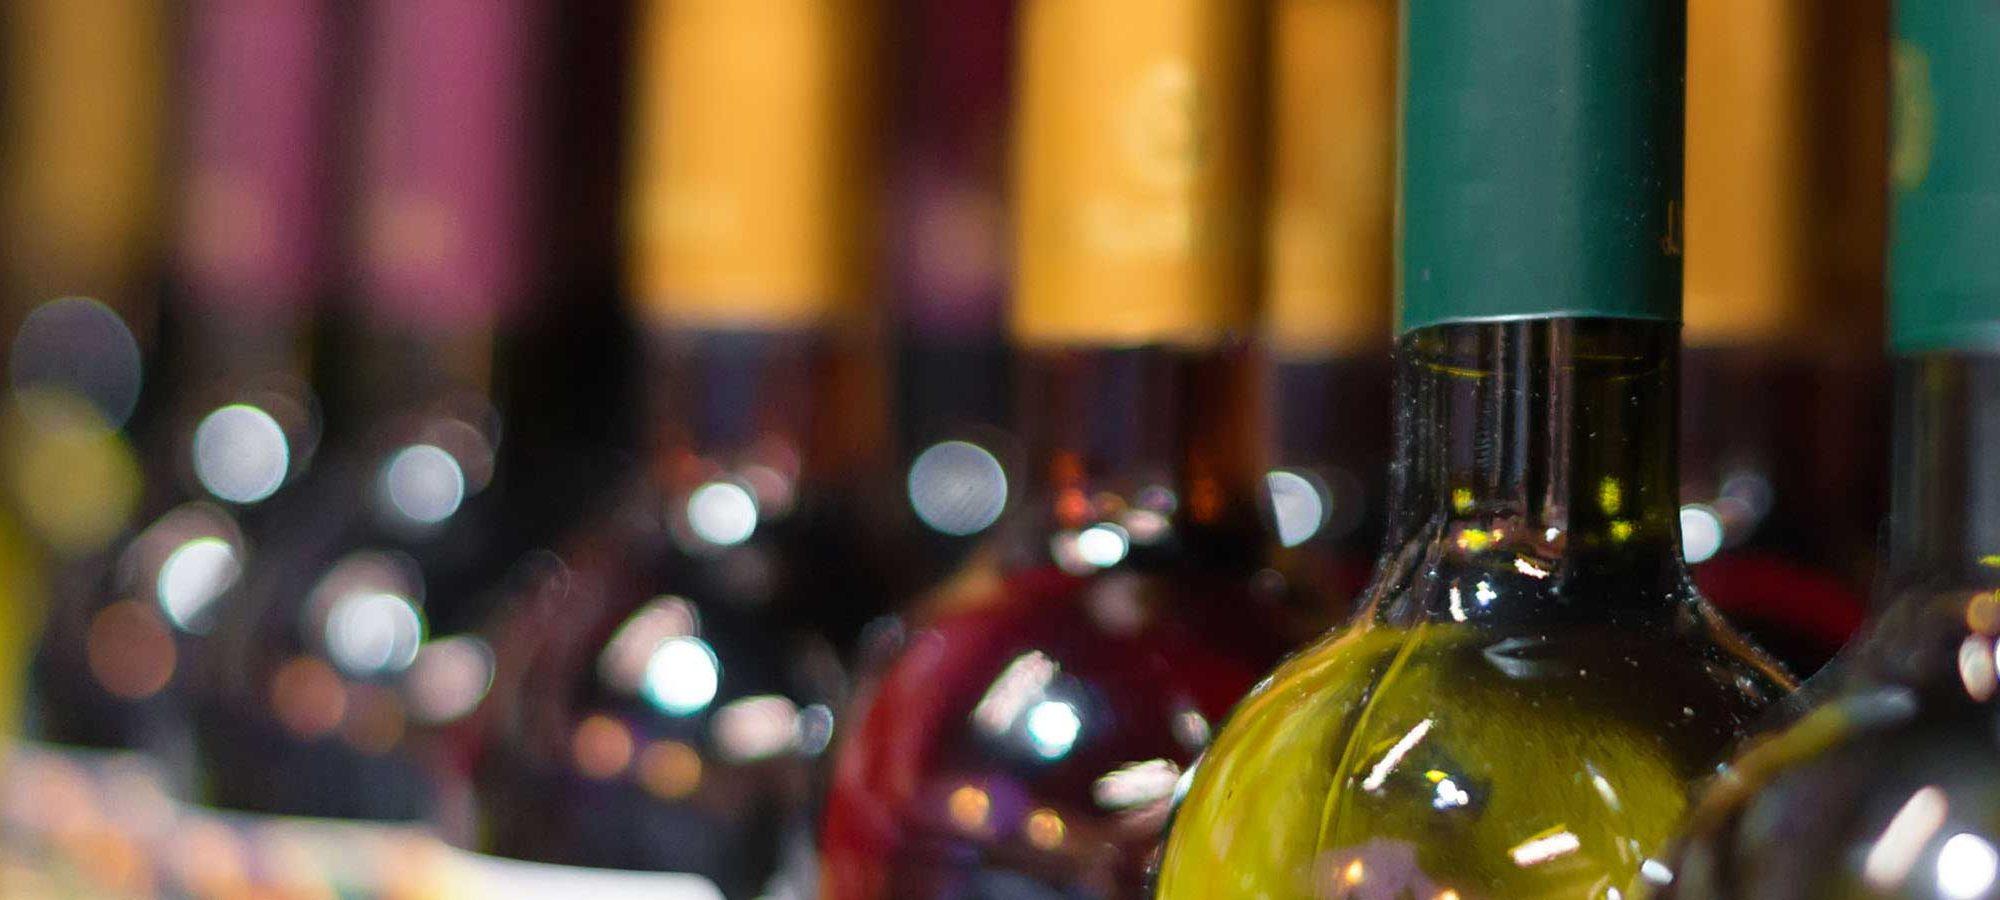 Dezember: Wein-Weihe in Hlohovec